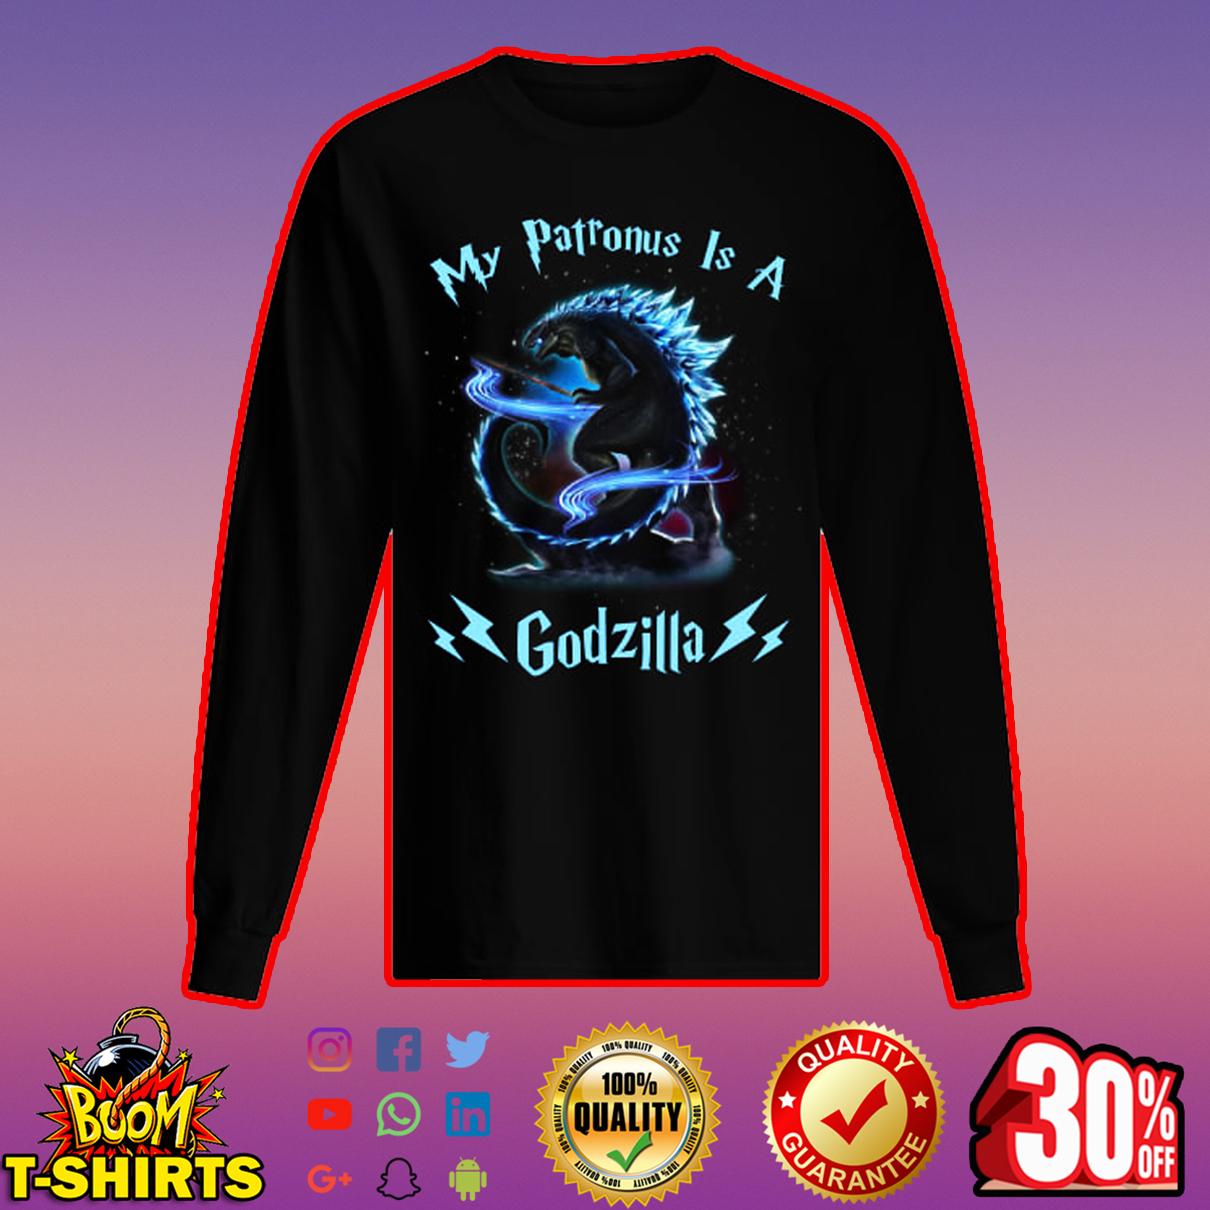 My patronus is a Godzilla long sleeved t-shirt